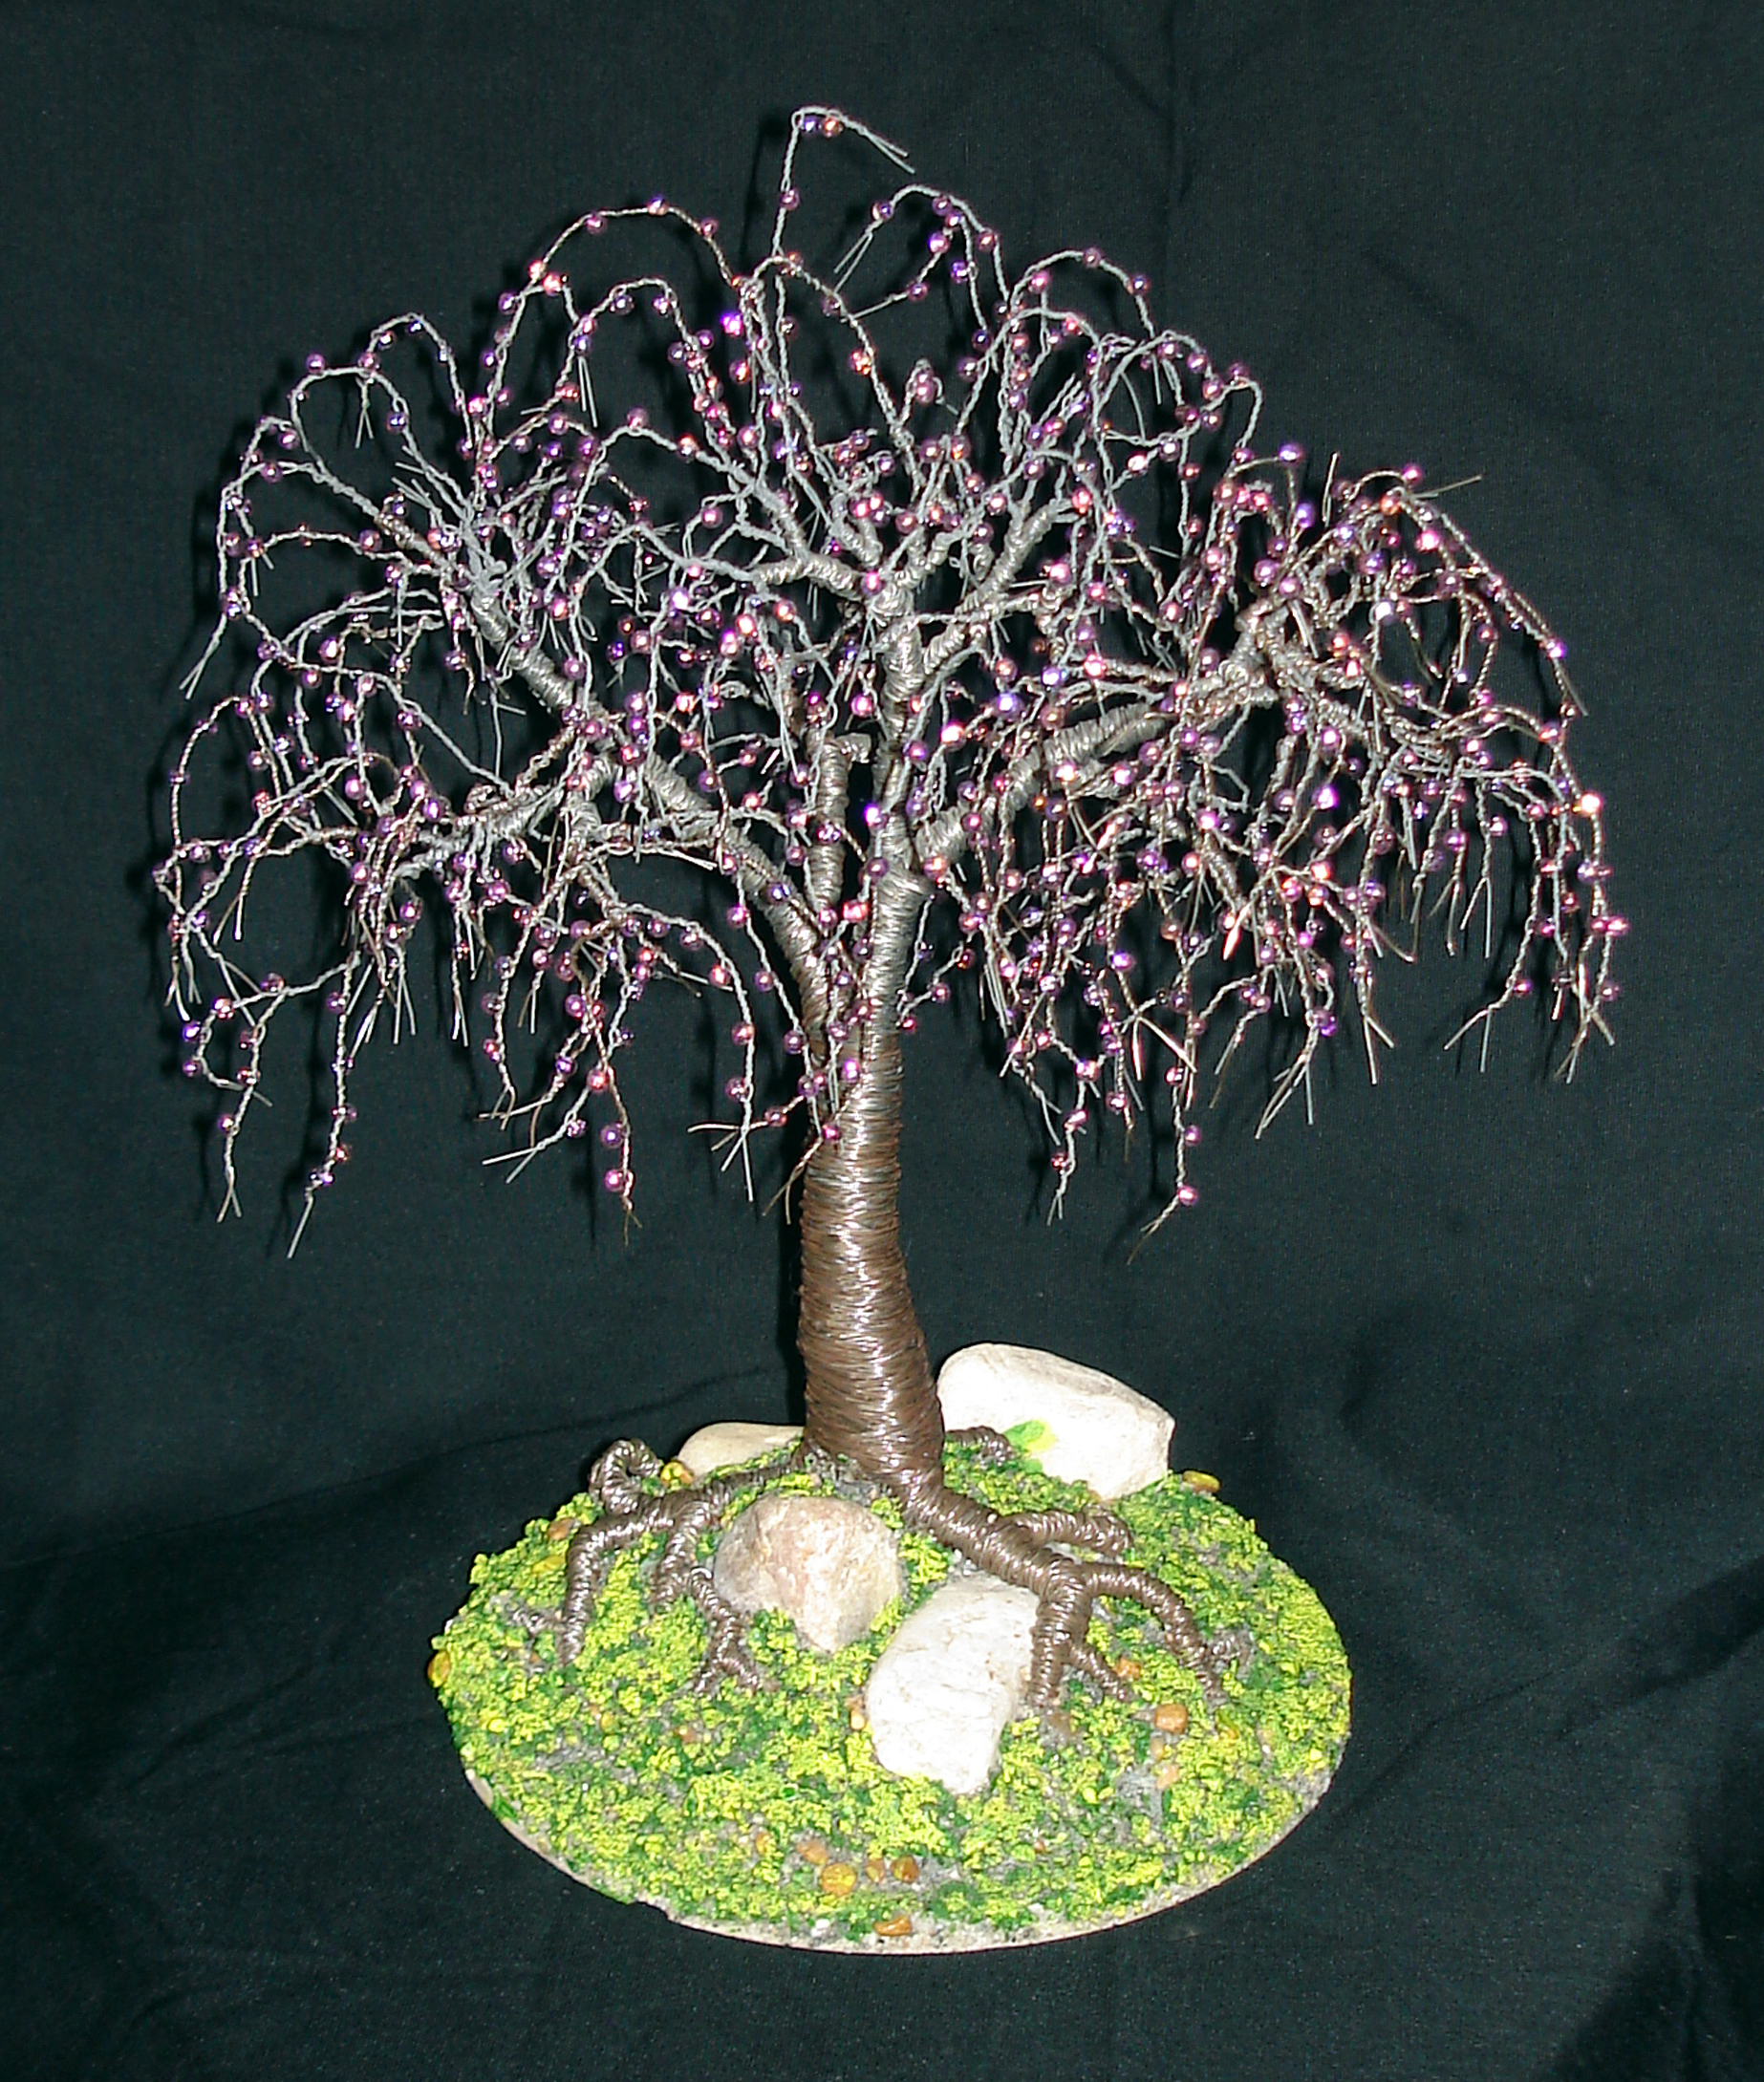 Steel Elm, Beaded wire tree sculpture   SalVillano   Foundmyself